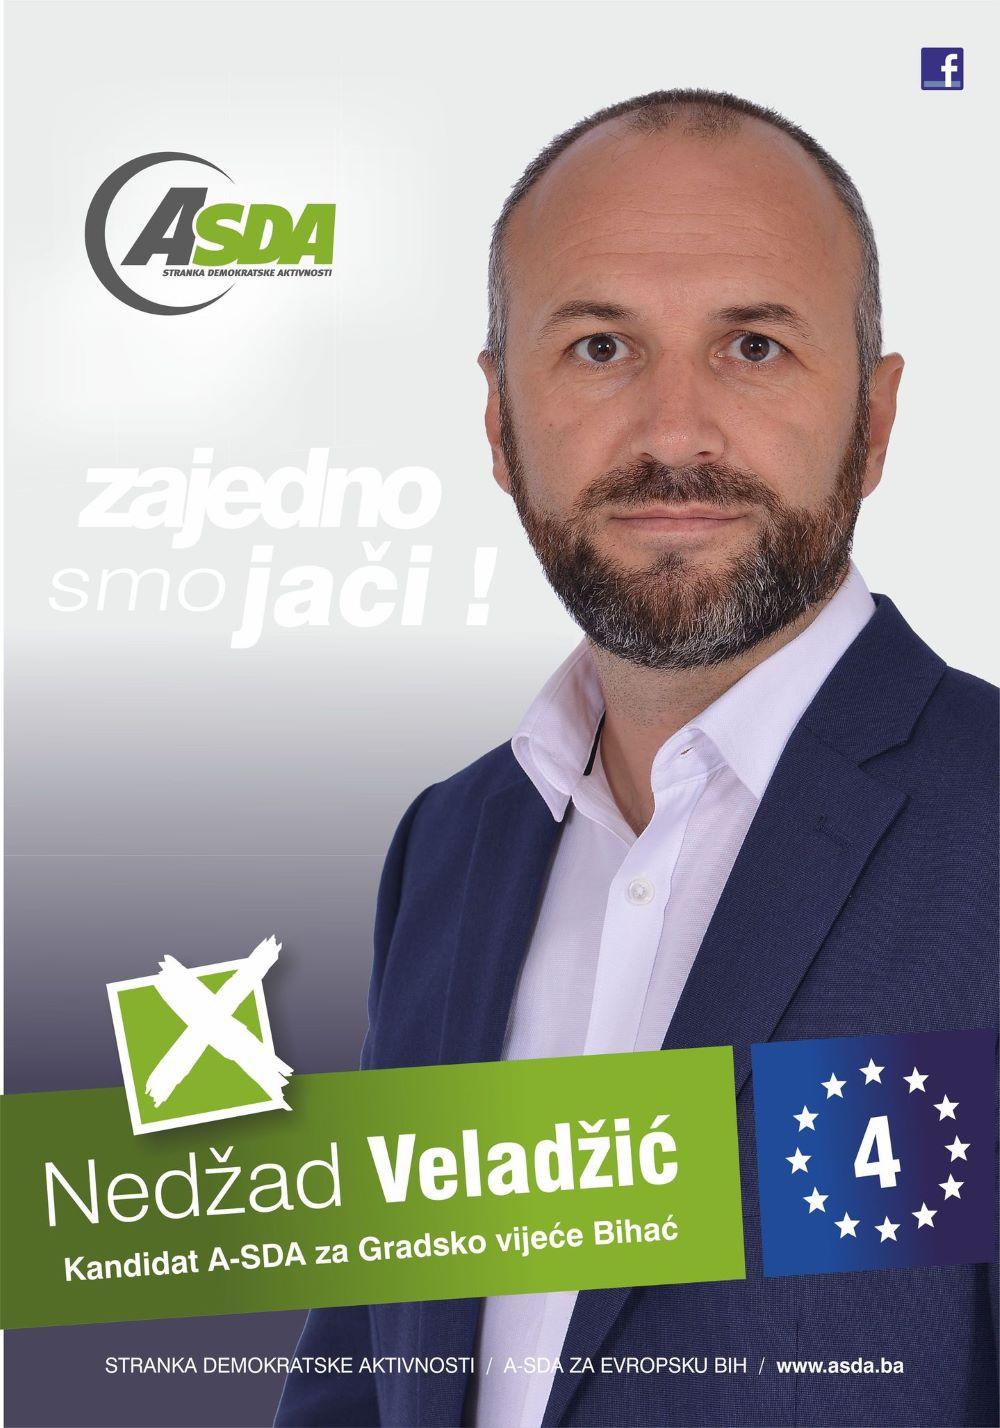 Nedžad Veladžić